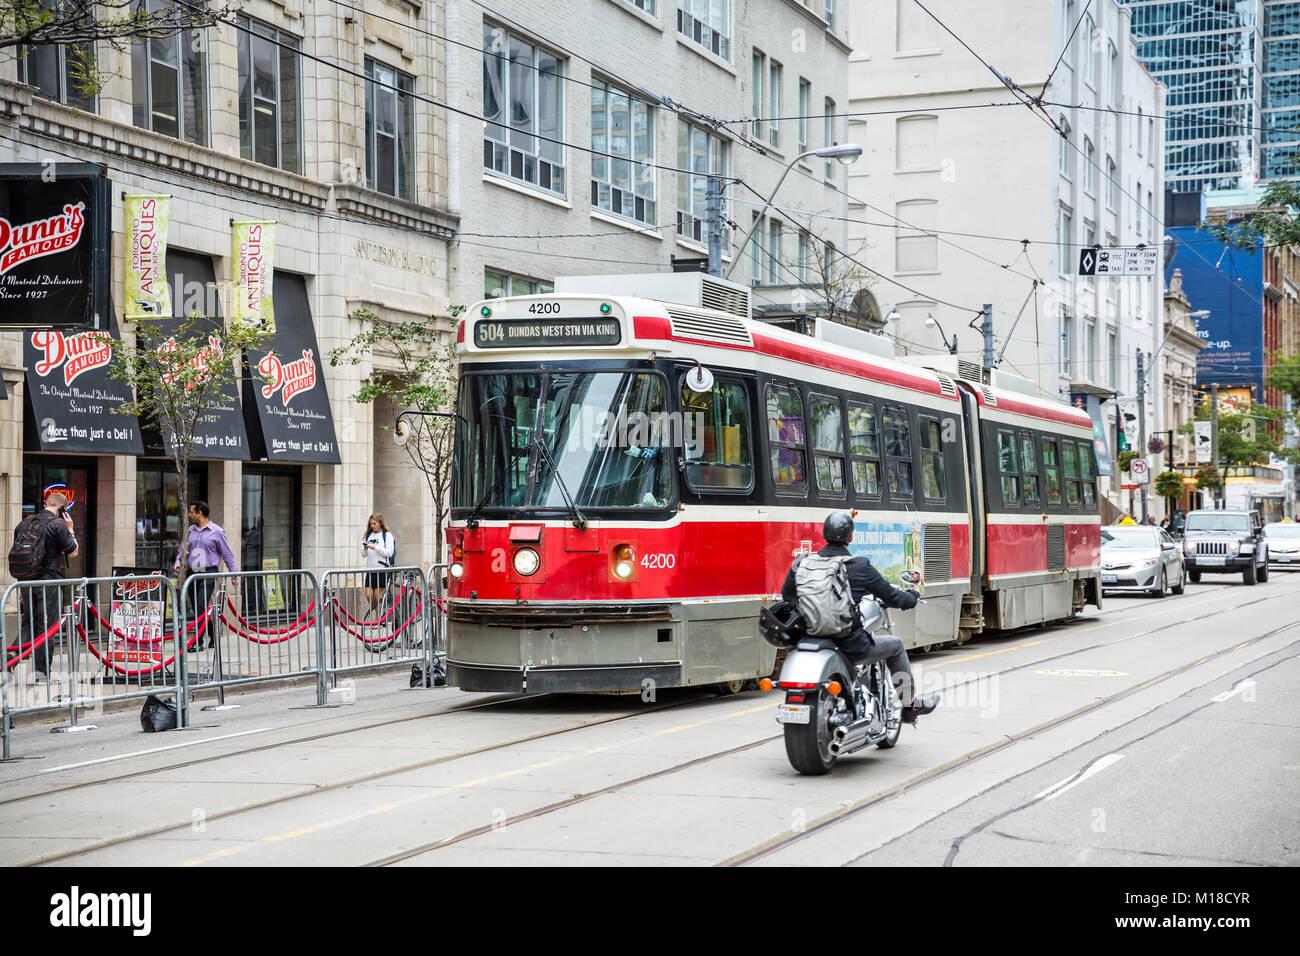 Streetcar in downtown Toronto, Ontario, Canada. - Stock Image